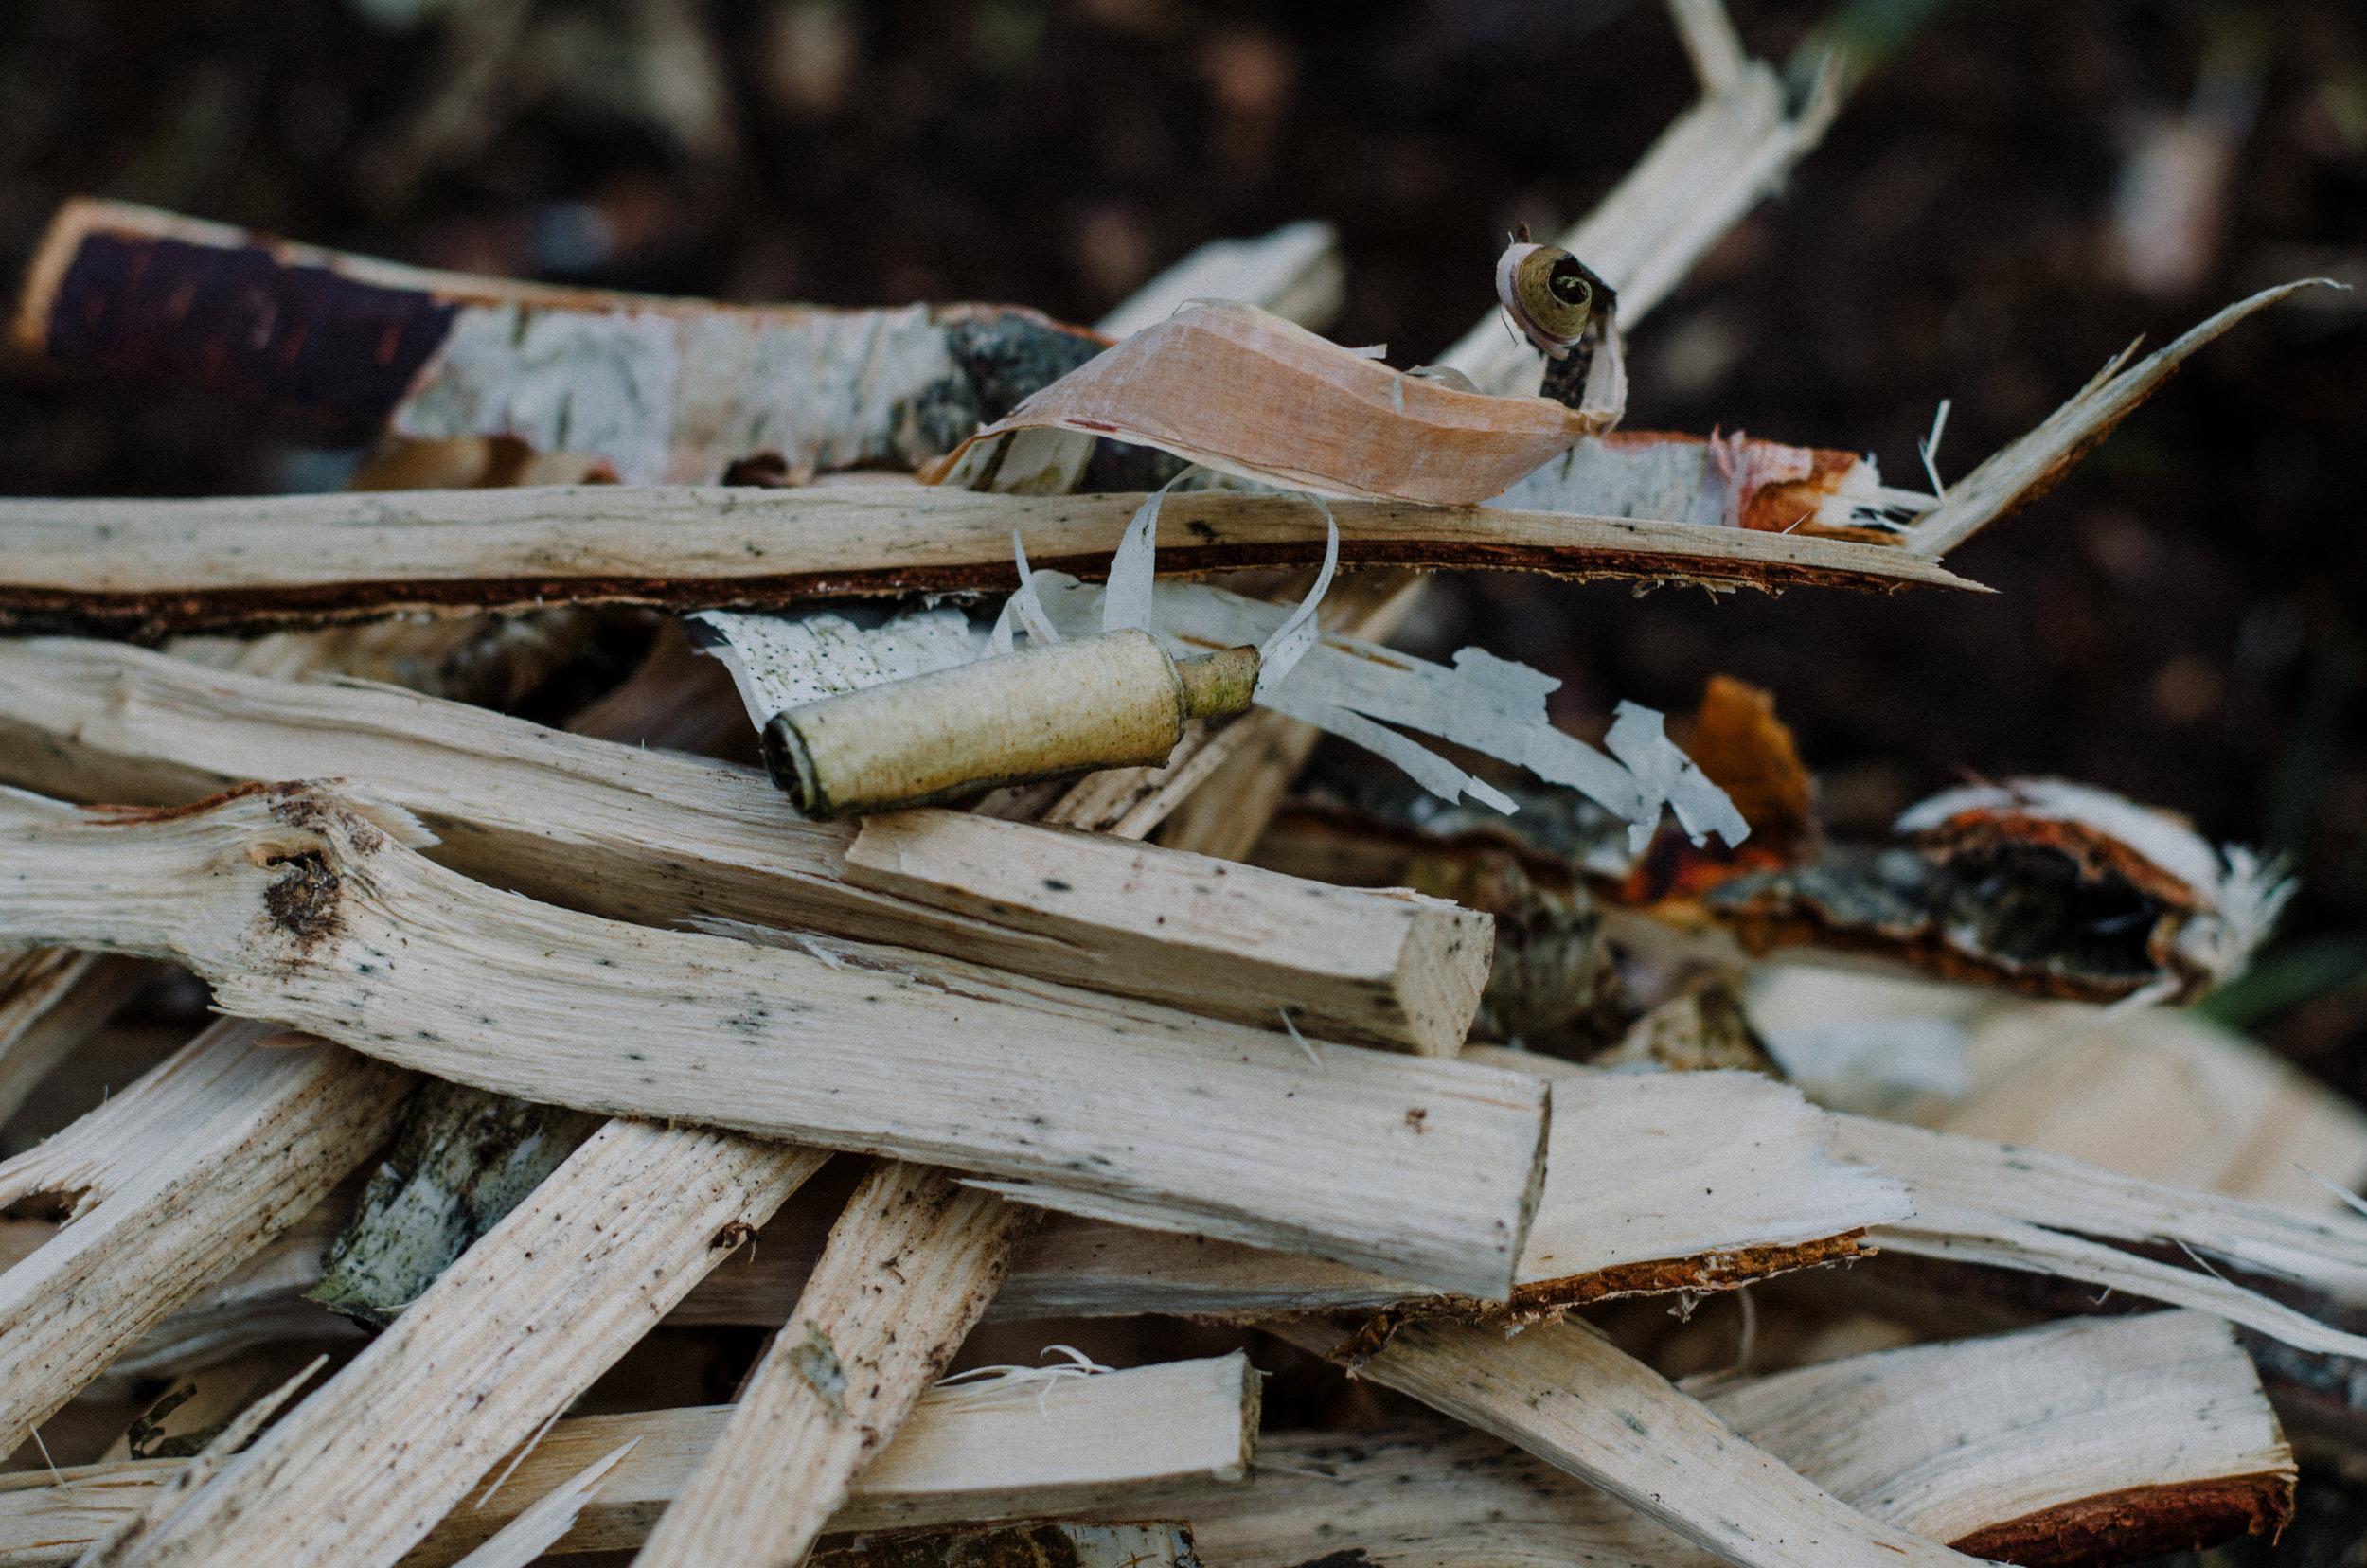 Fire & Wild- Wild Garlic & Campfire Dinner - Aiste Saulyte Photography-102.jpg